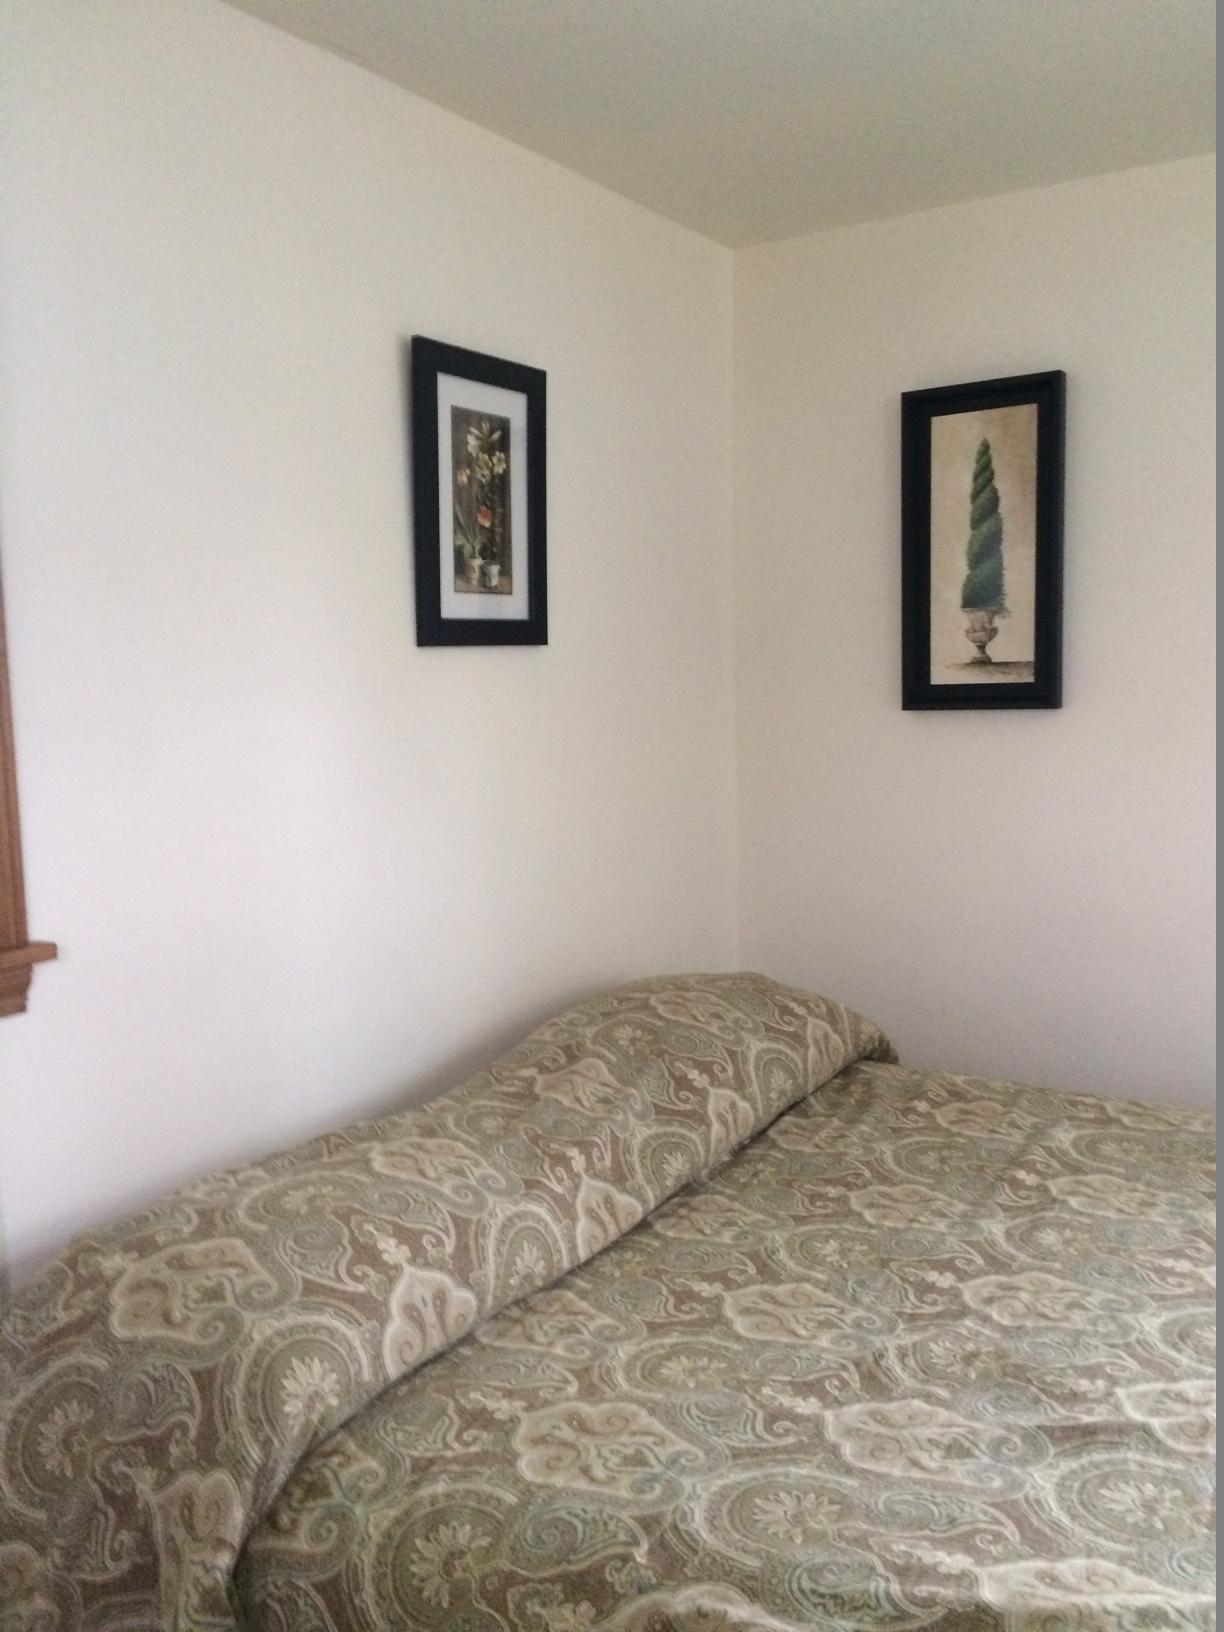 Blue Spruce Motel - Cabin Number 18 (1) - Interior Bed and Art.jpg